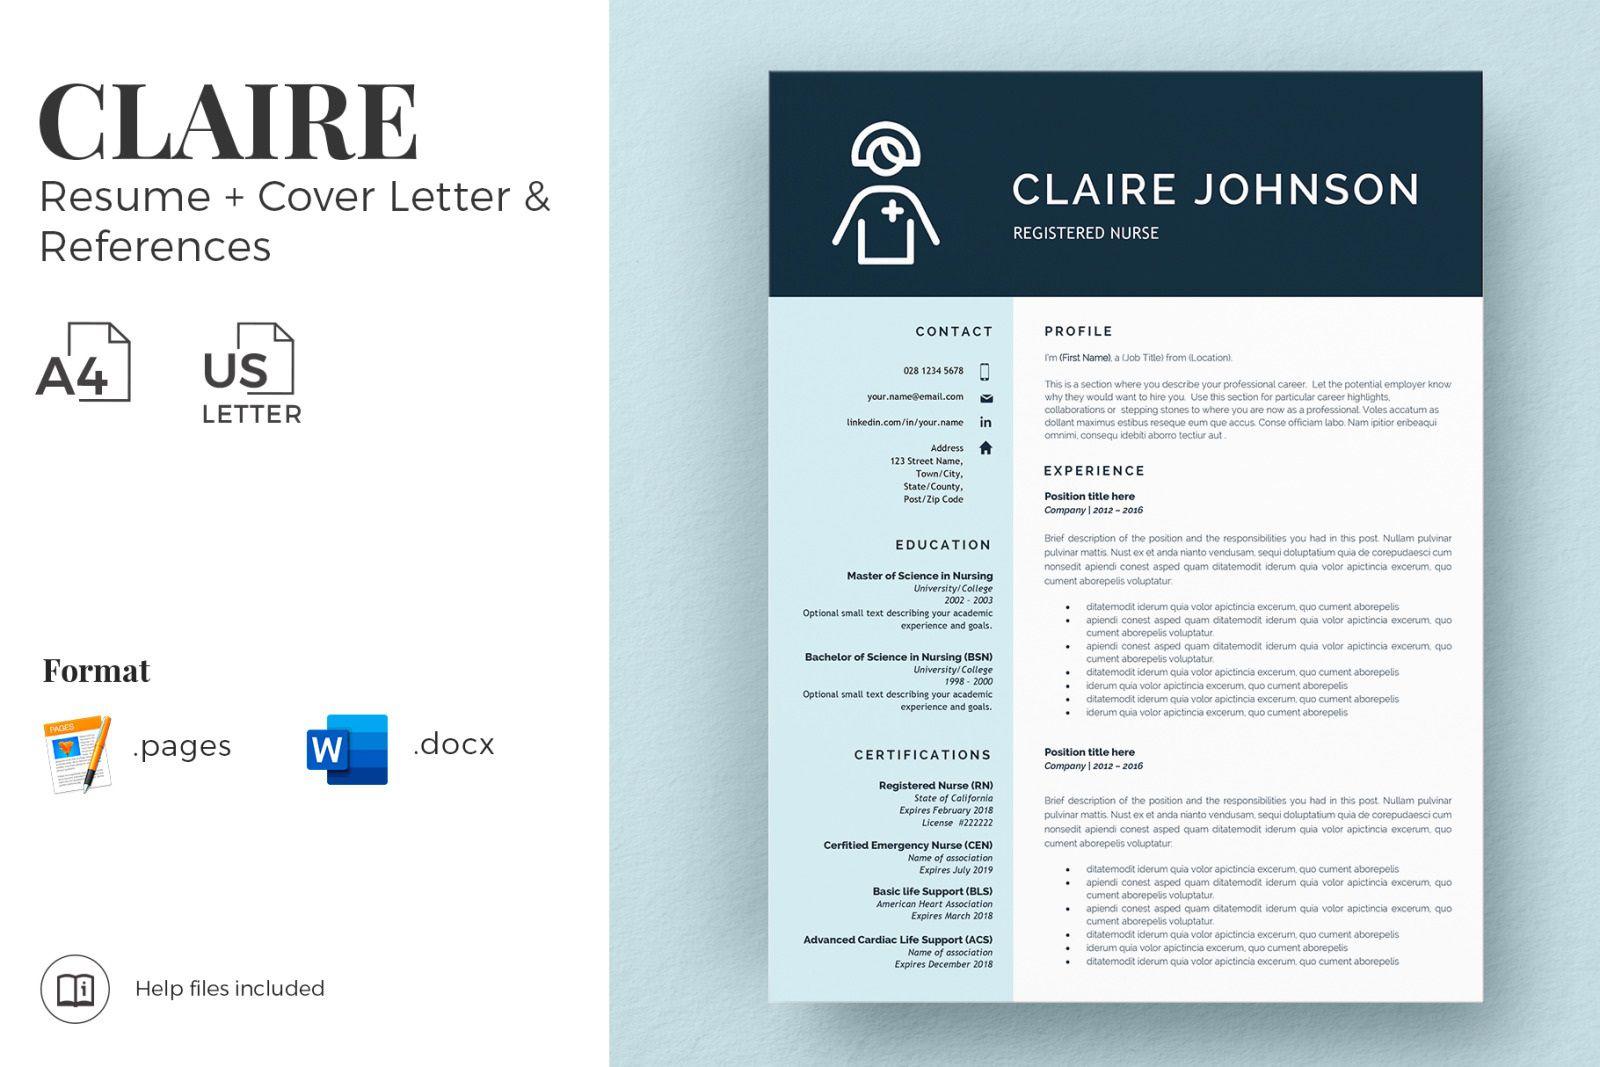 004 Wonderful Nursing Resume Template Word High Definition  Free Microsoft Nurse Cv Download RegisteredFull